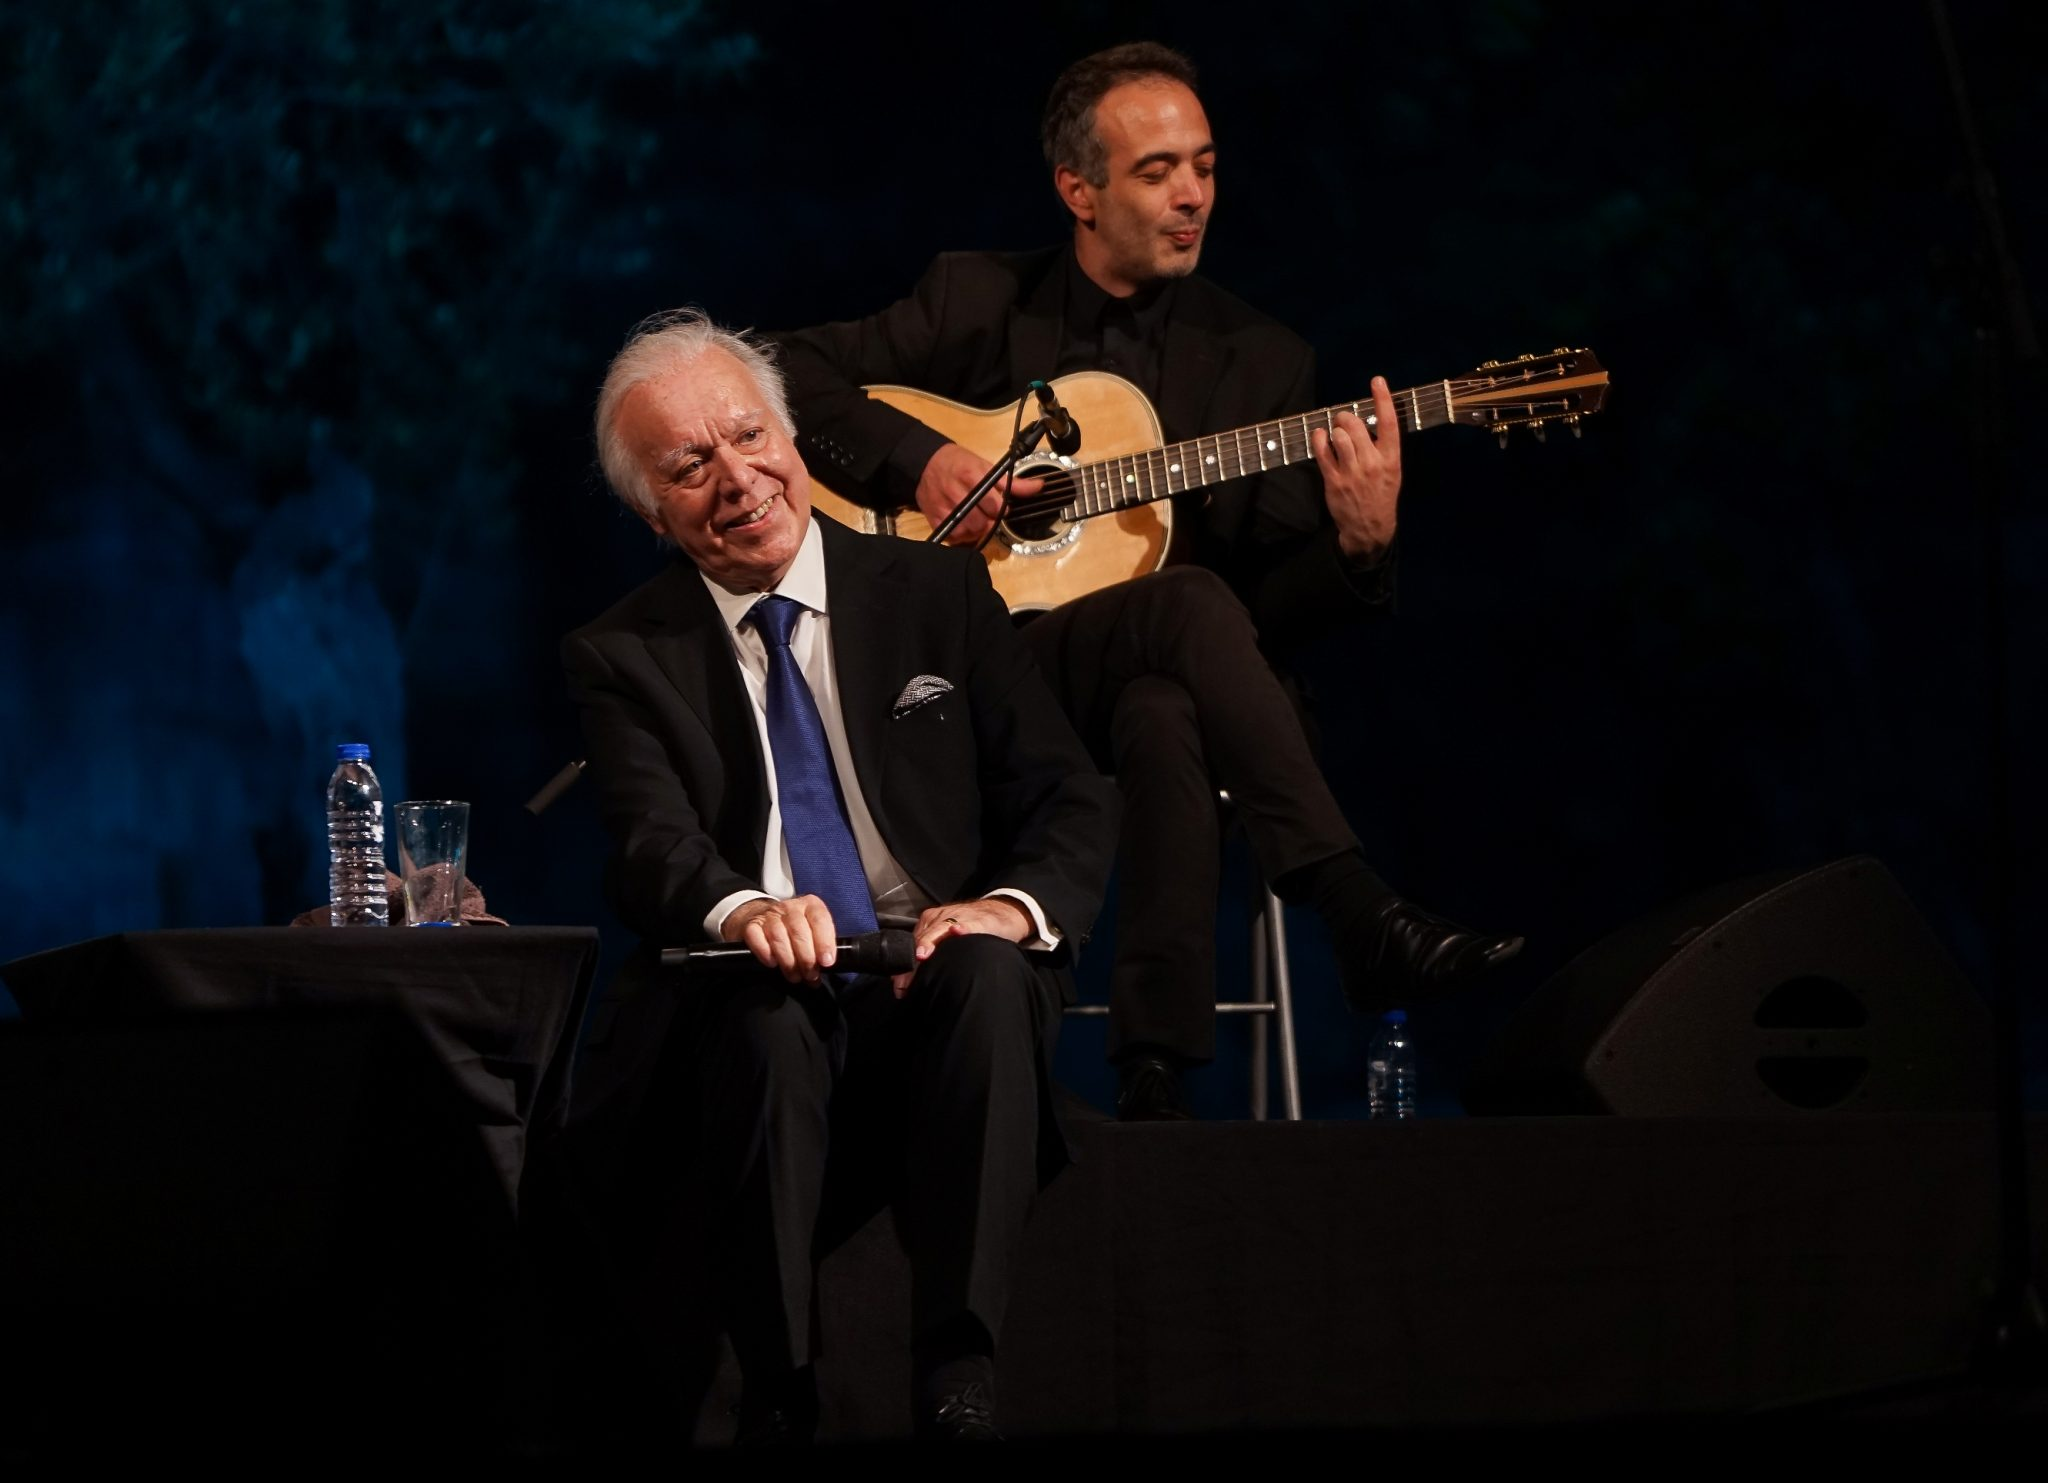 O fadista Carlos do Carmo sorri para o público, de frente para o observador, sentado no palco. Atrás do fadista o viola de fado.